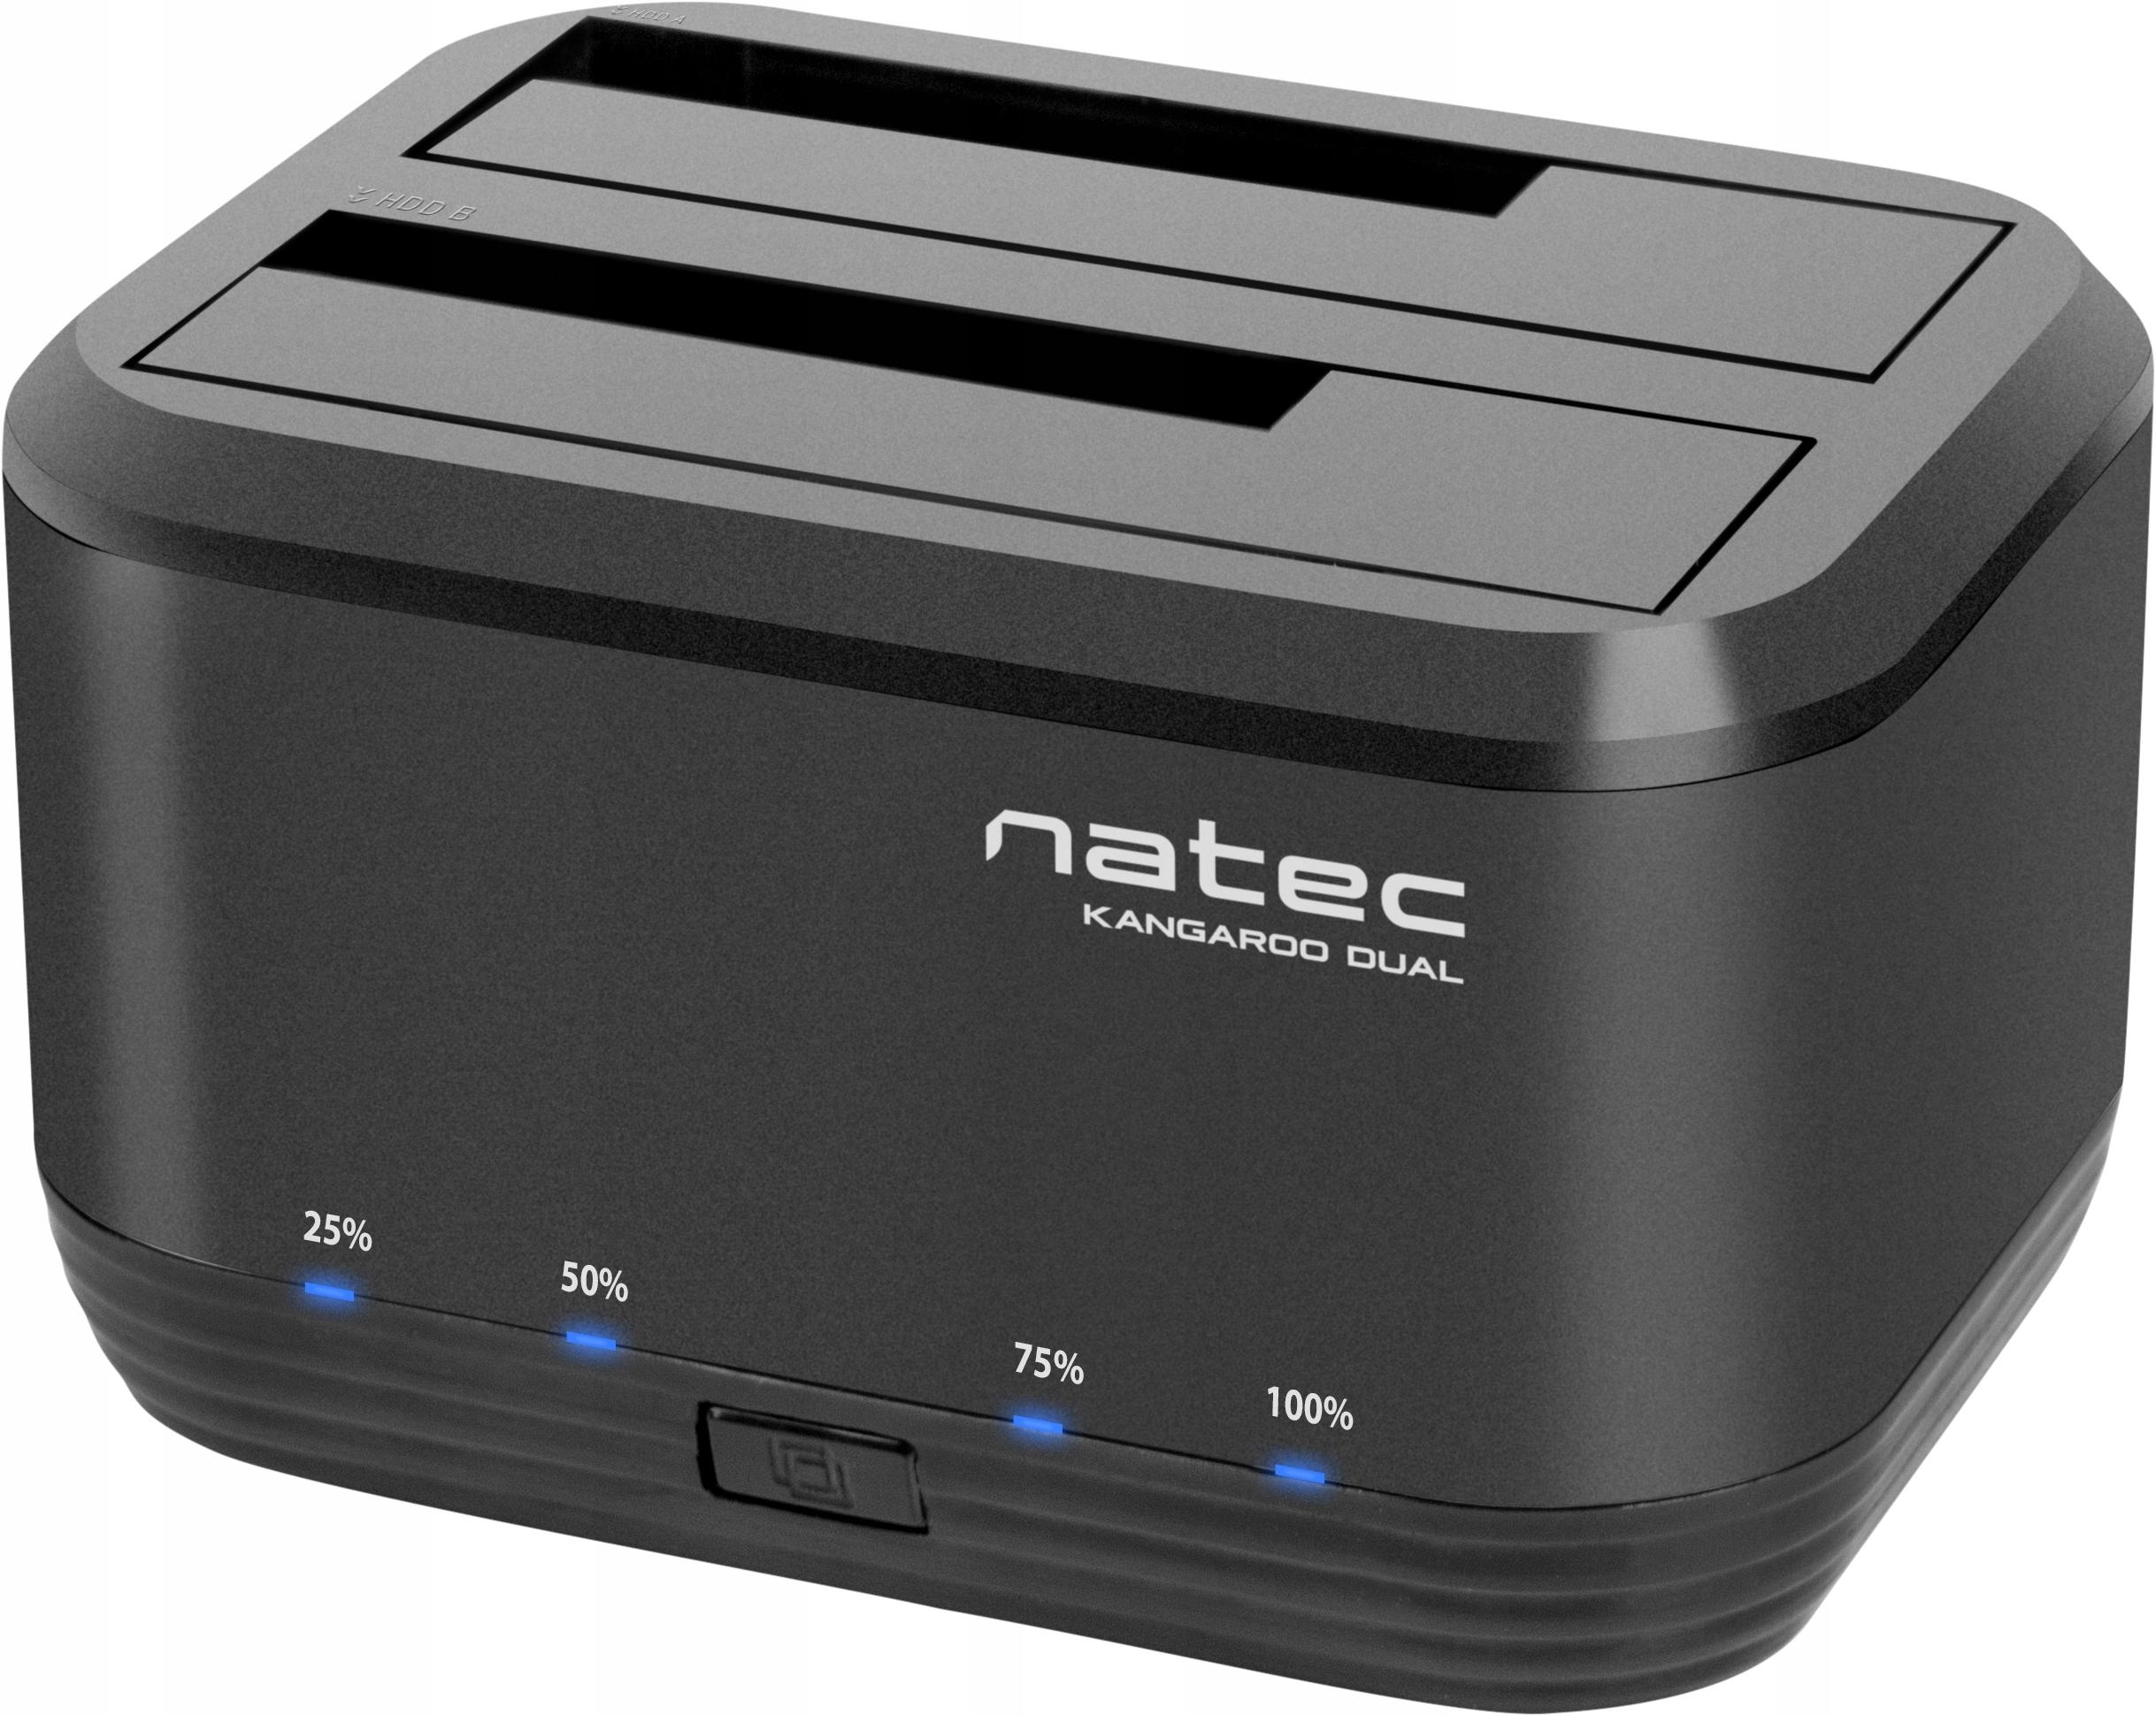 HDD NATEC DUAL SATA 2.5 / 3.5 USB 3